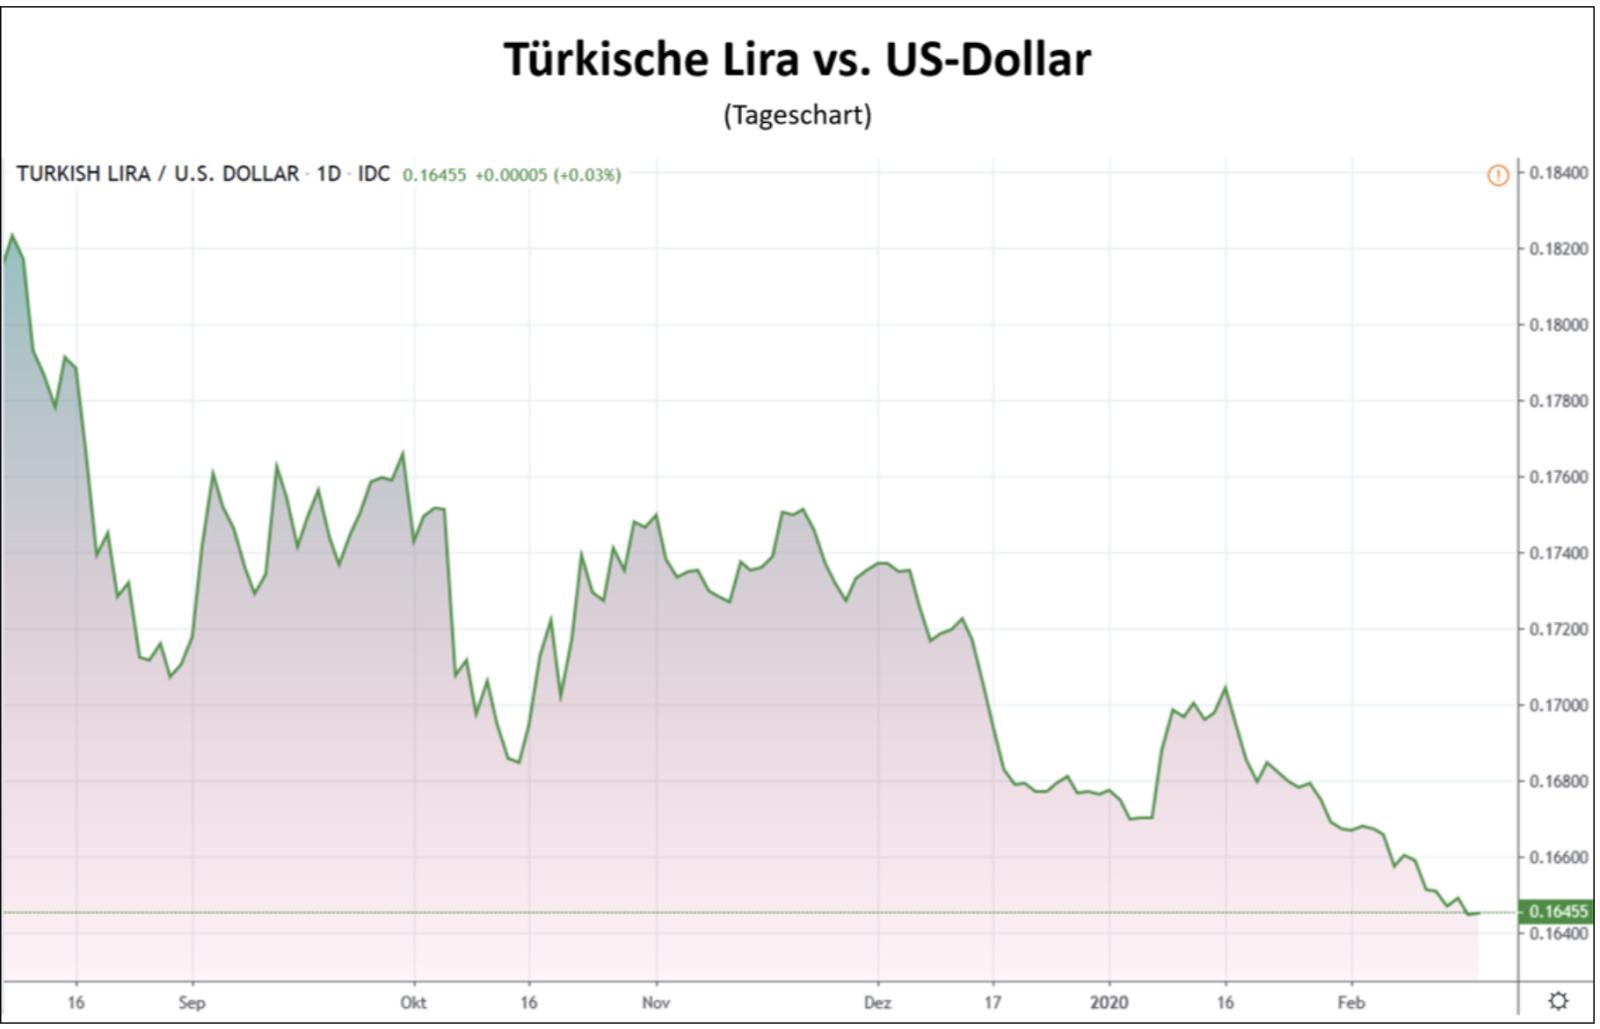 Türkische Lira vs US-Dollar